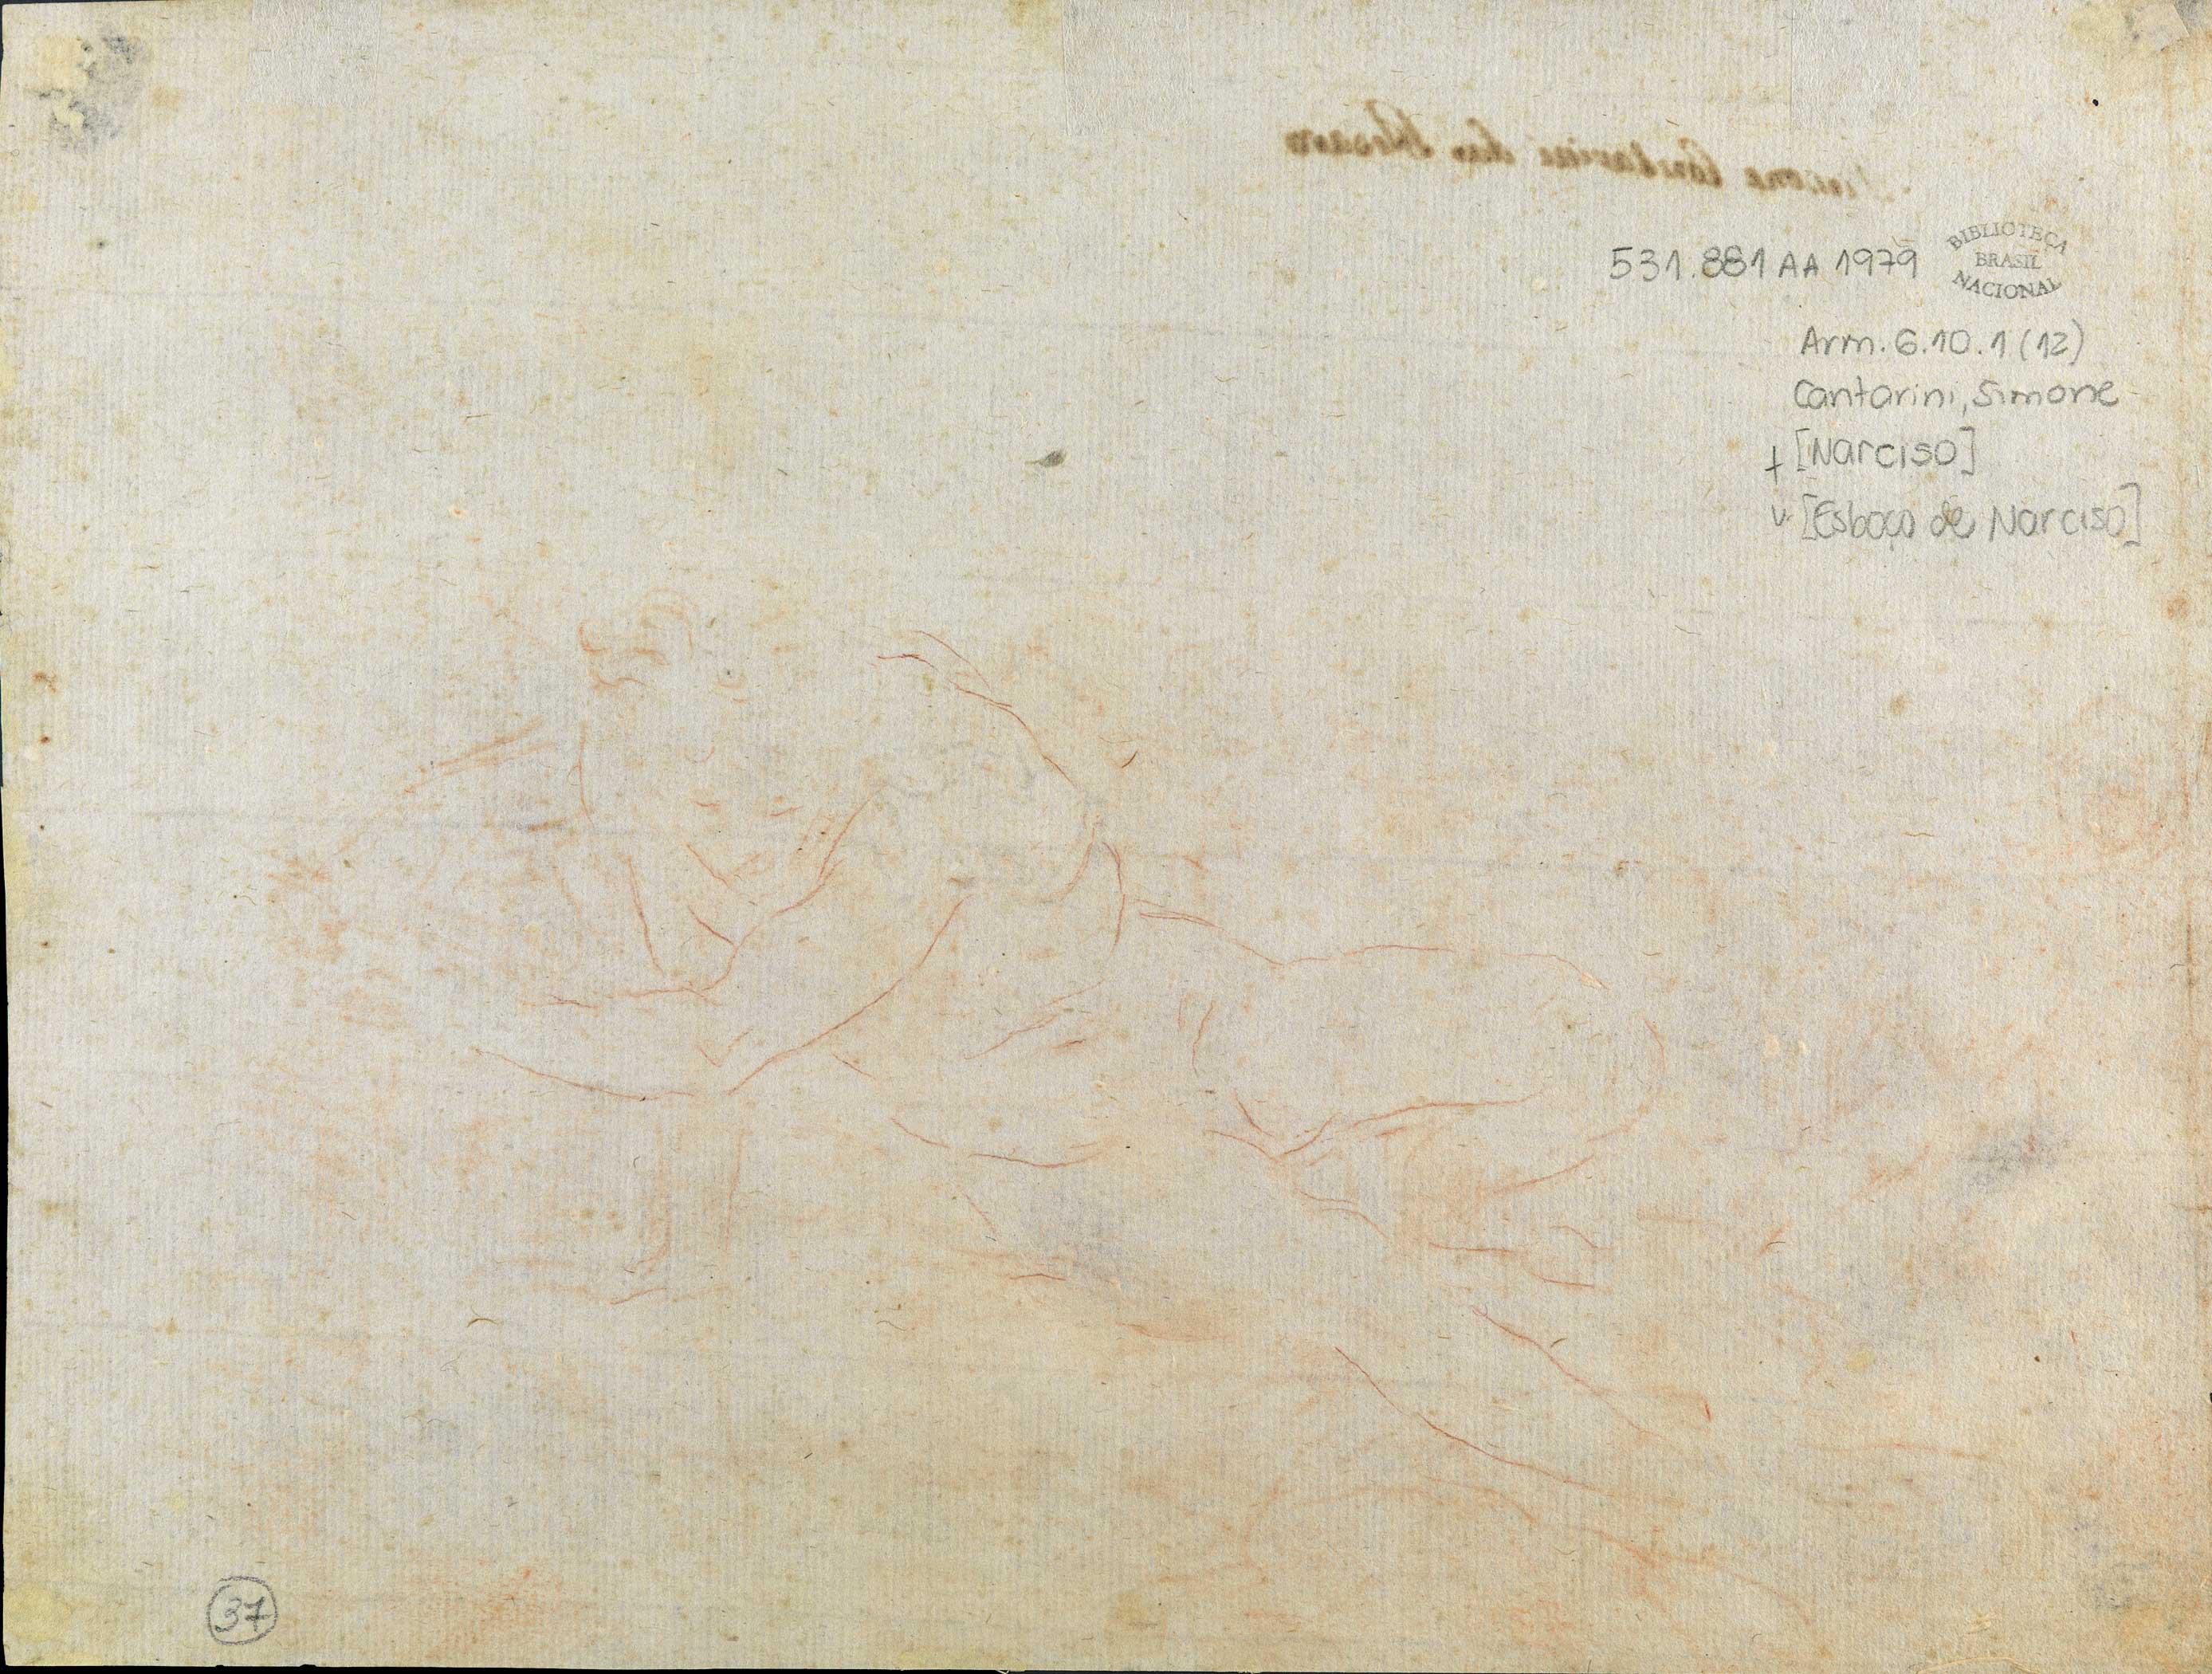 File Simone Cantarini Esboco De Narciso Jpg Wikimedia Commons